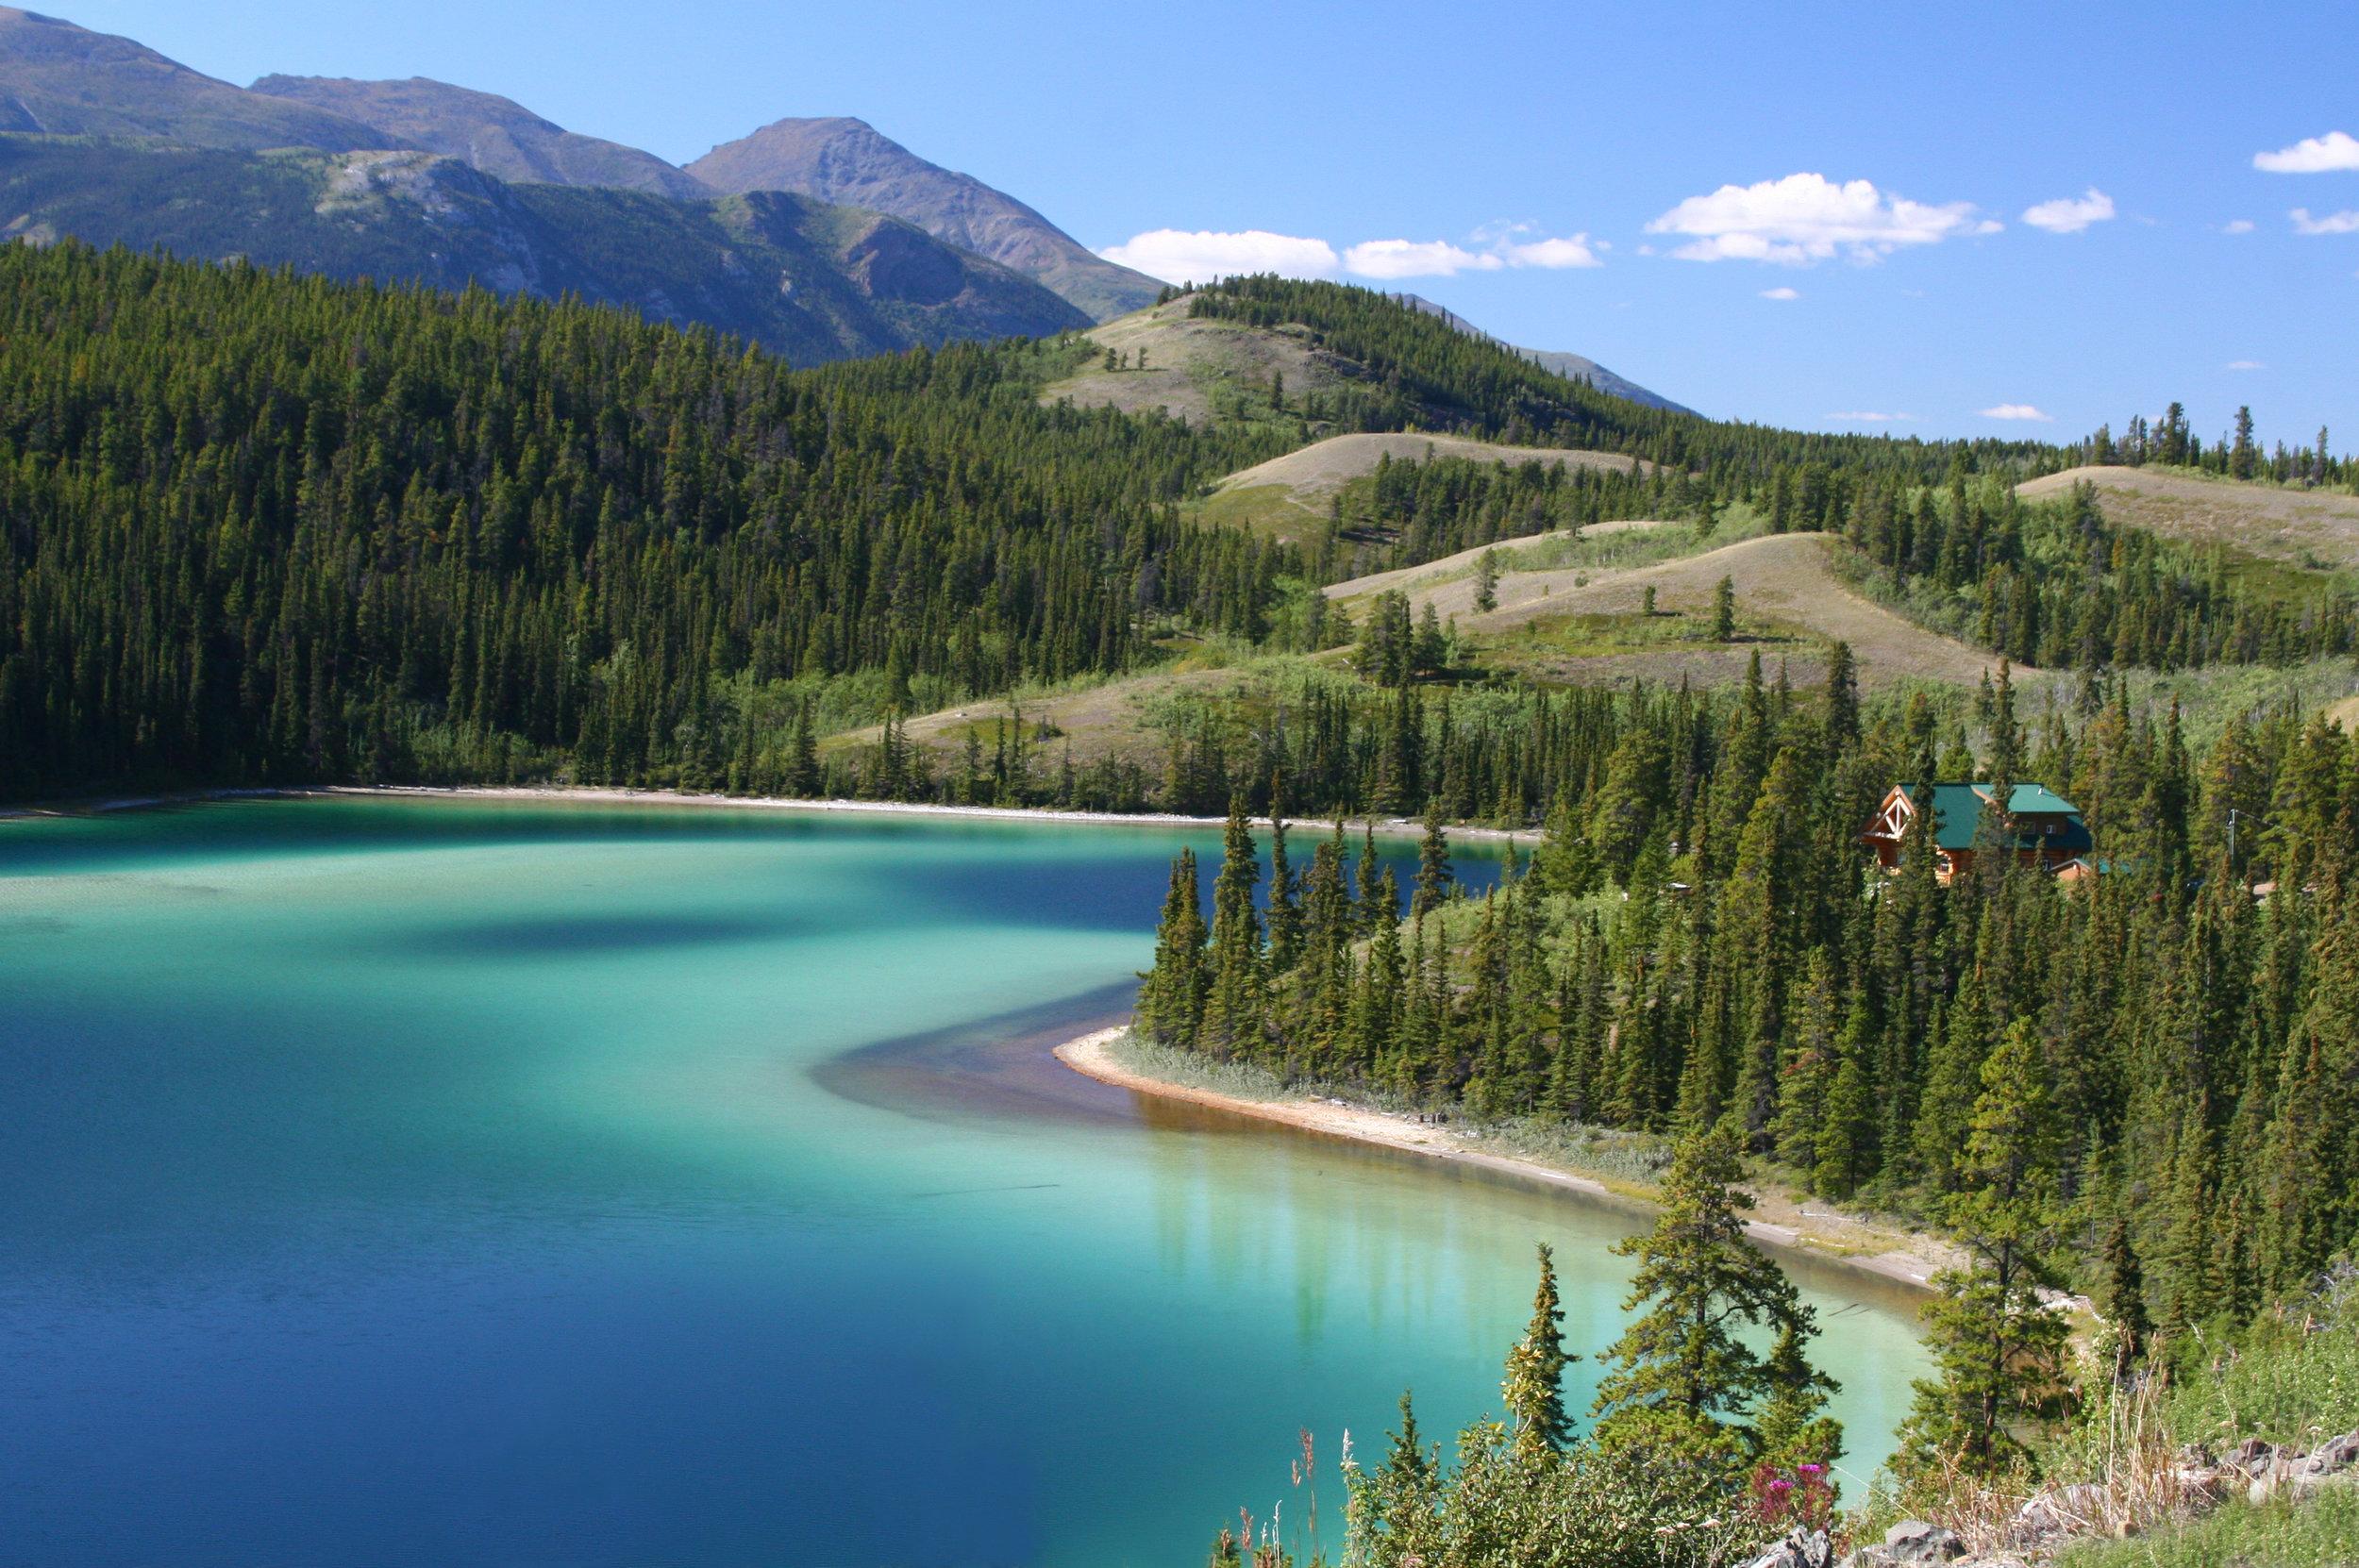 sur mesure-Canada-Lake Louise dreamstime_m_12435895 - Copie.jpg